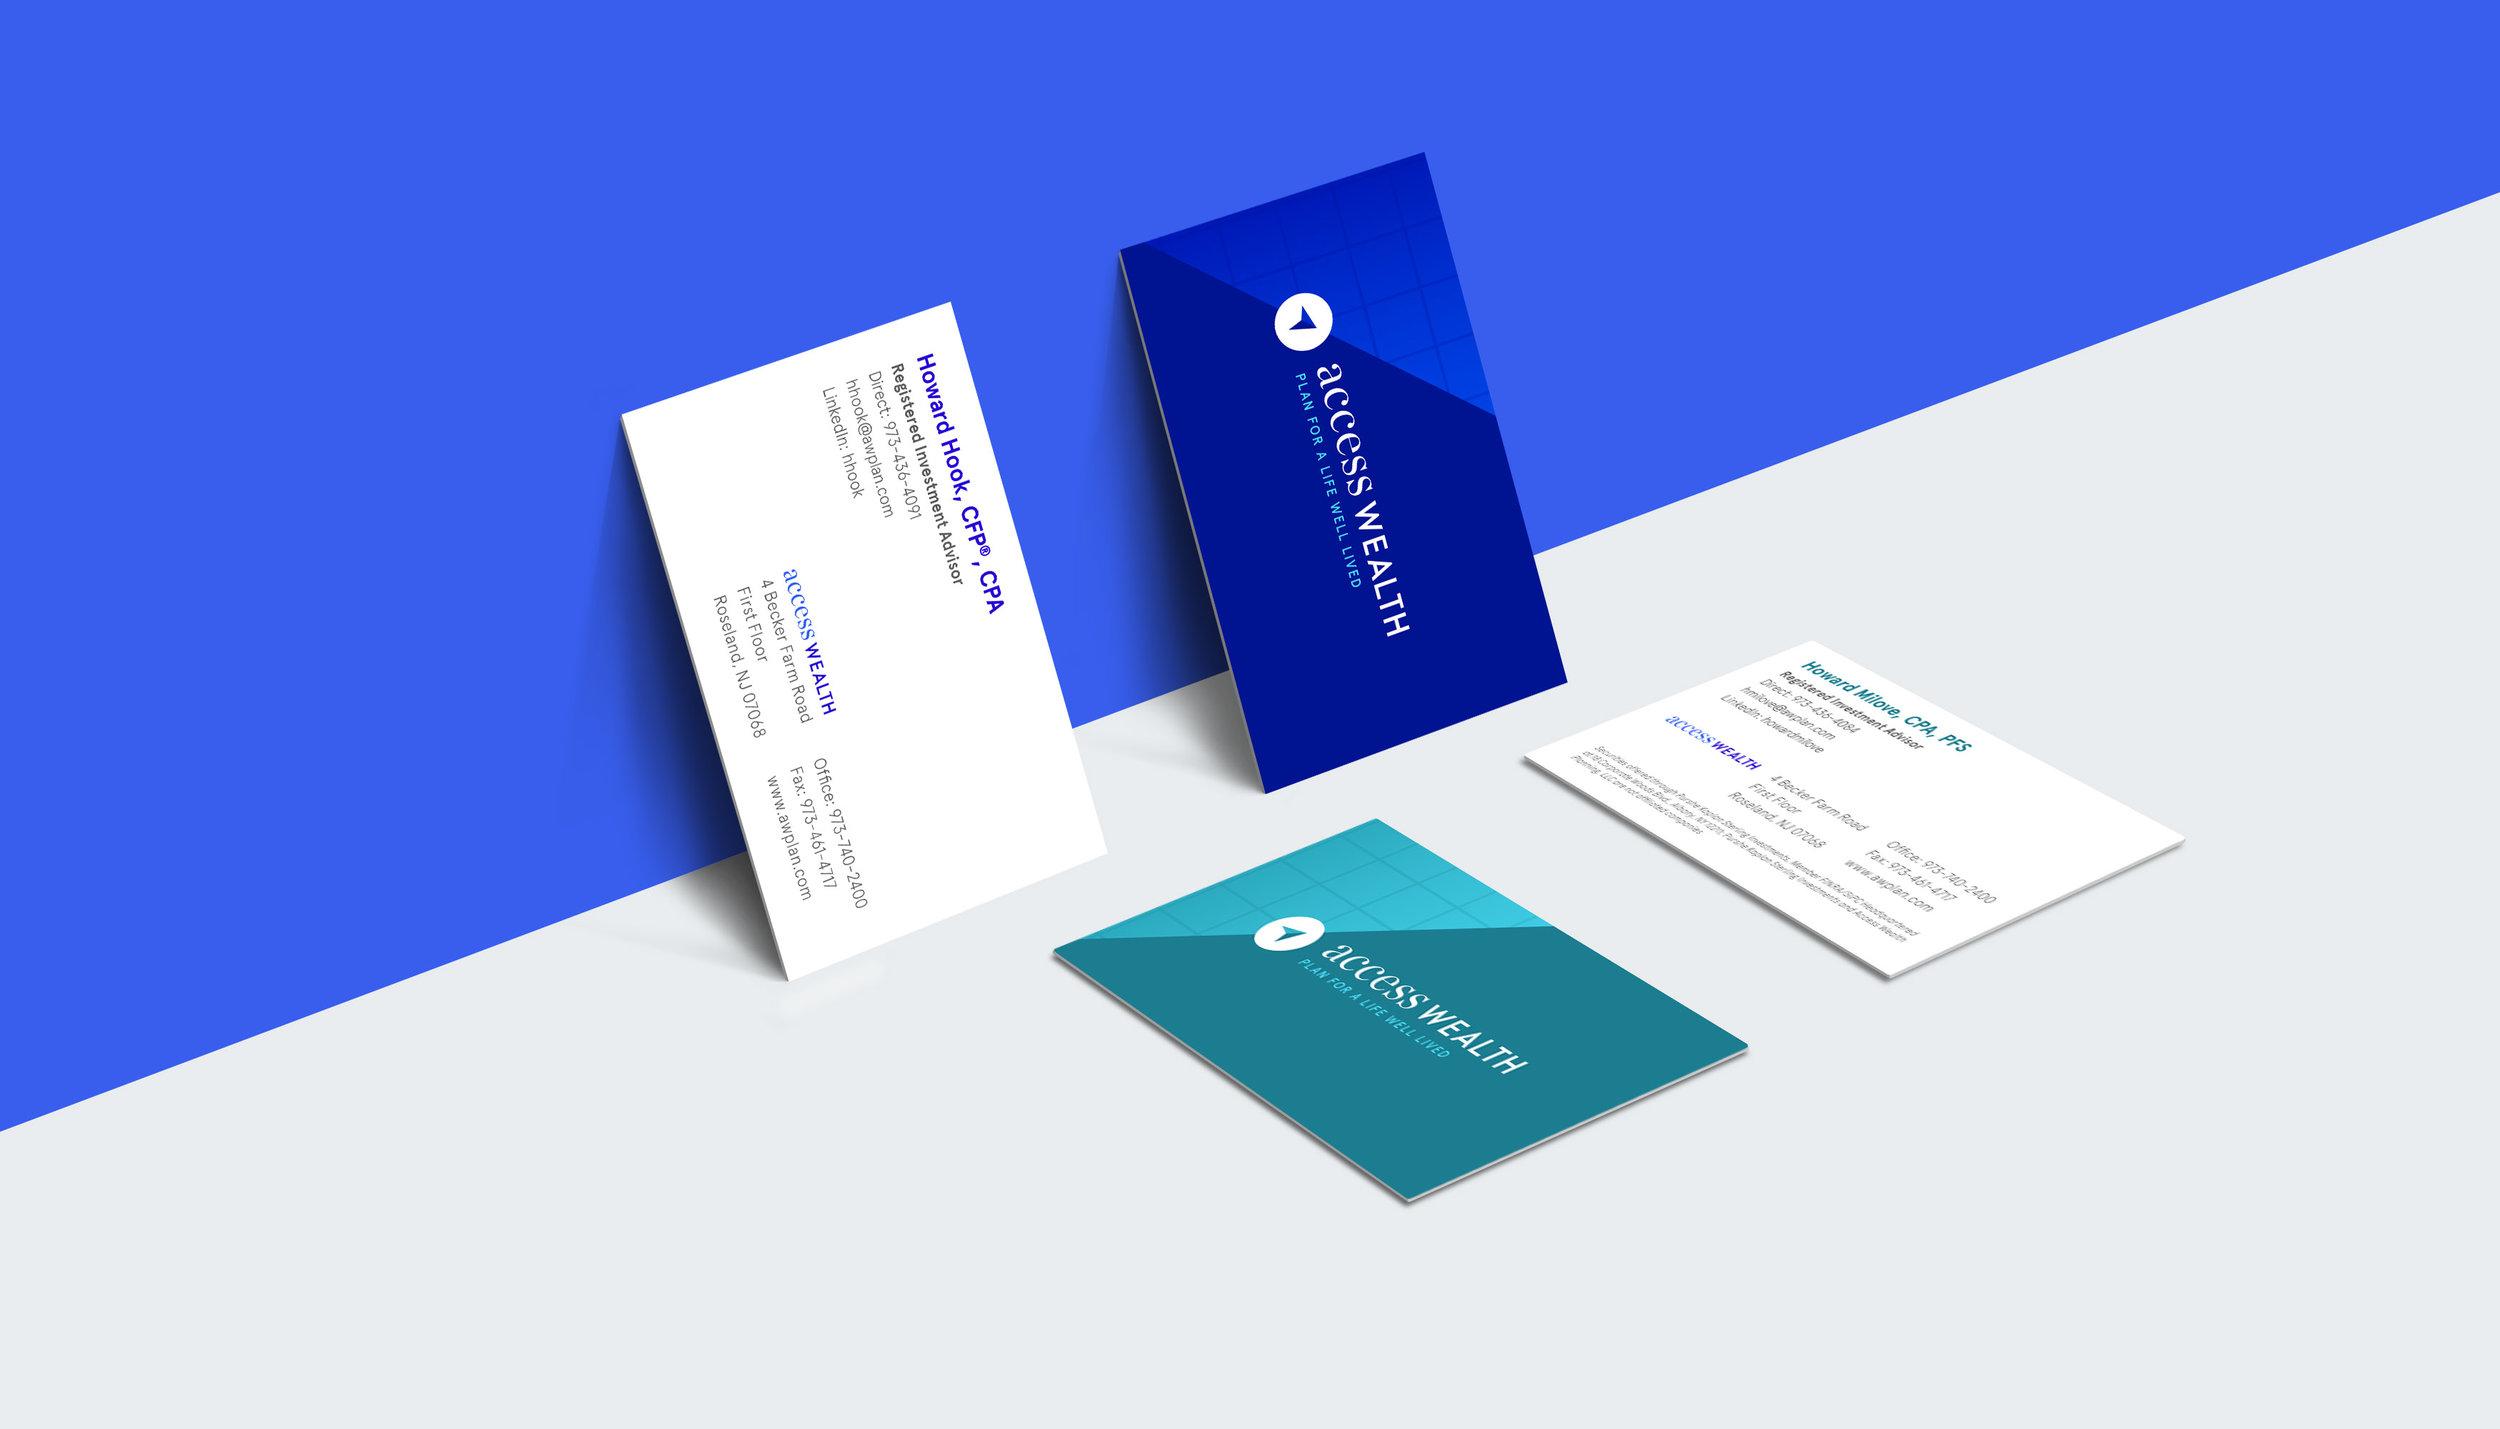 James-Rivas_Access-Wealth_Business-Cards.jpg